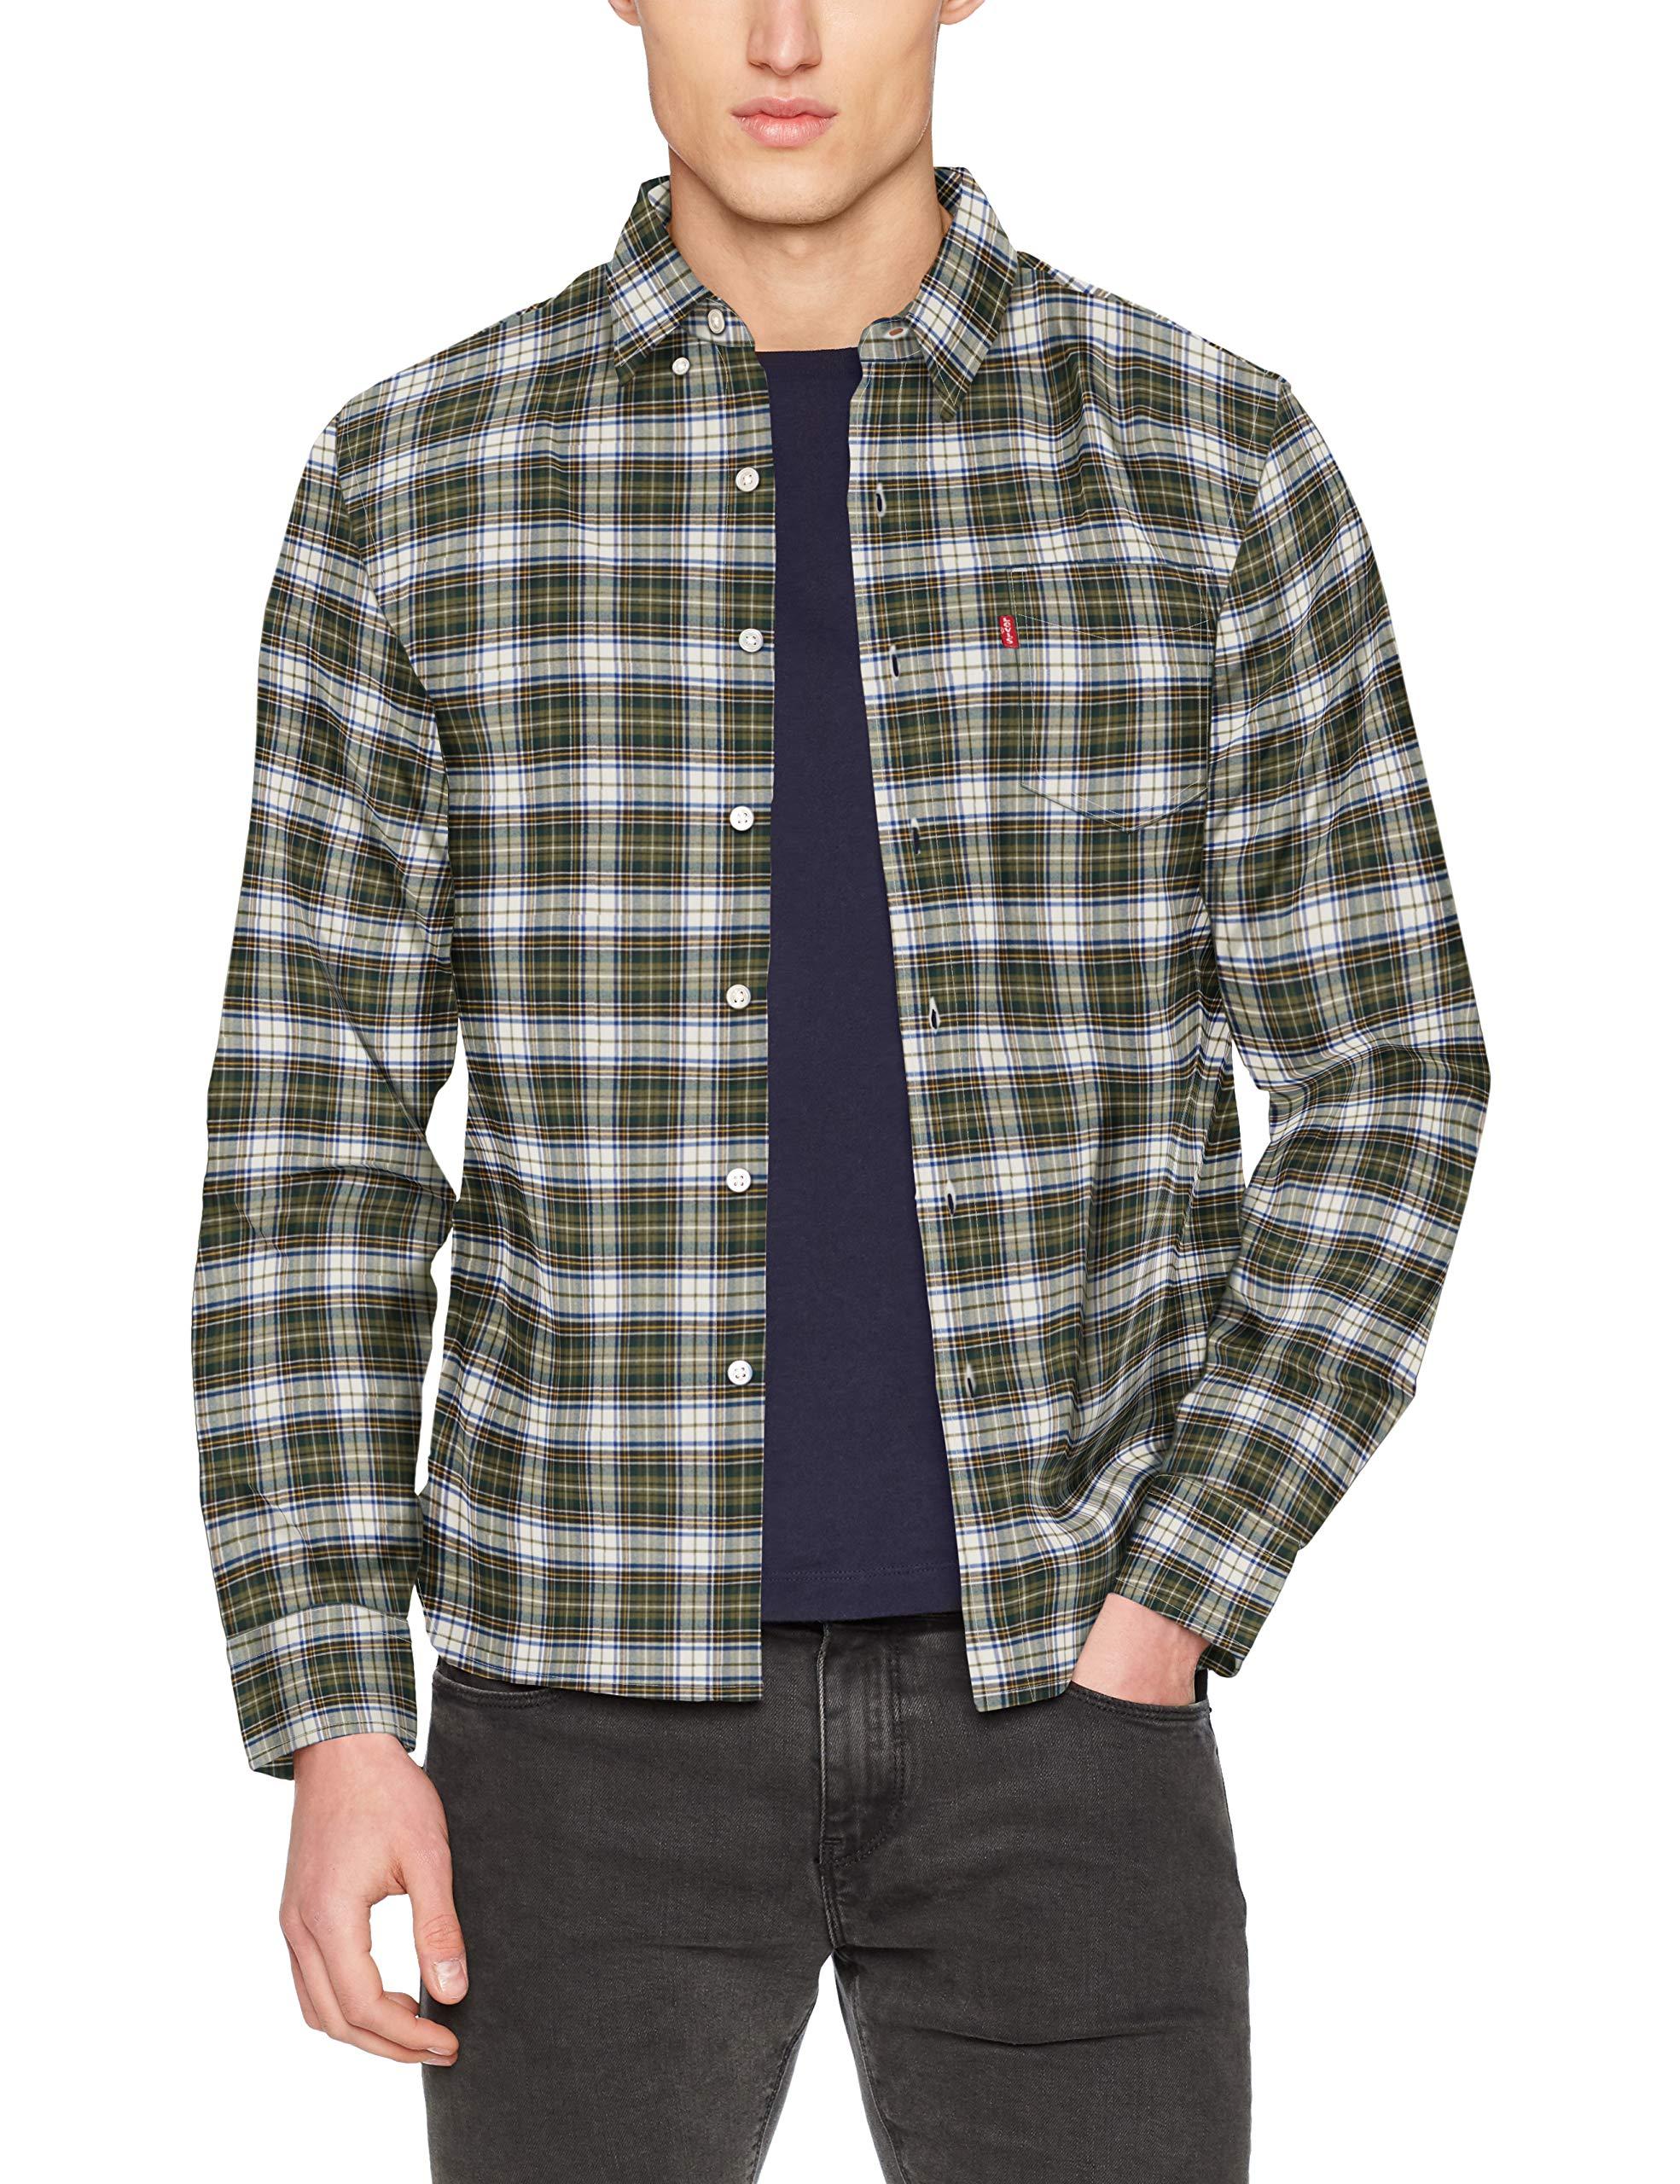 Levi's Herren Sunset 1 Pocket Shirt Freizeithemd, Mehrfarbig (Waconia Pine Grove 0431), Large